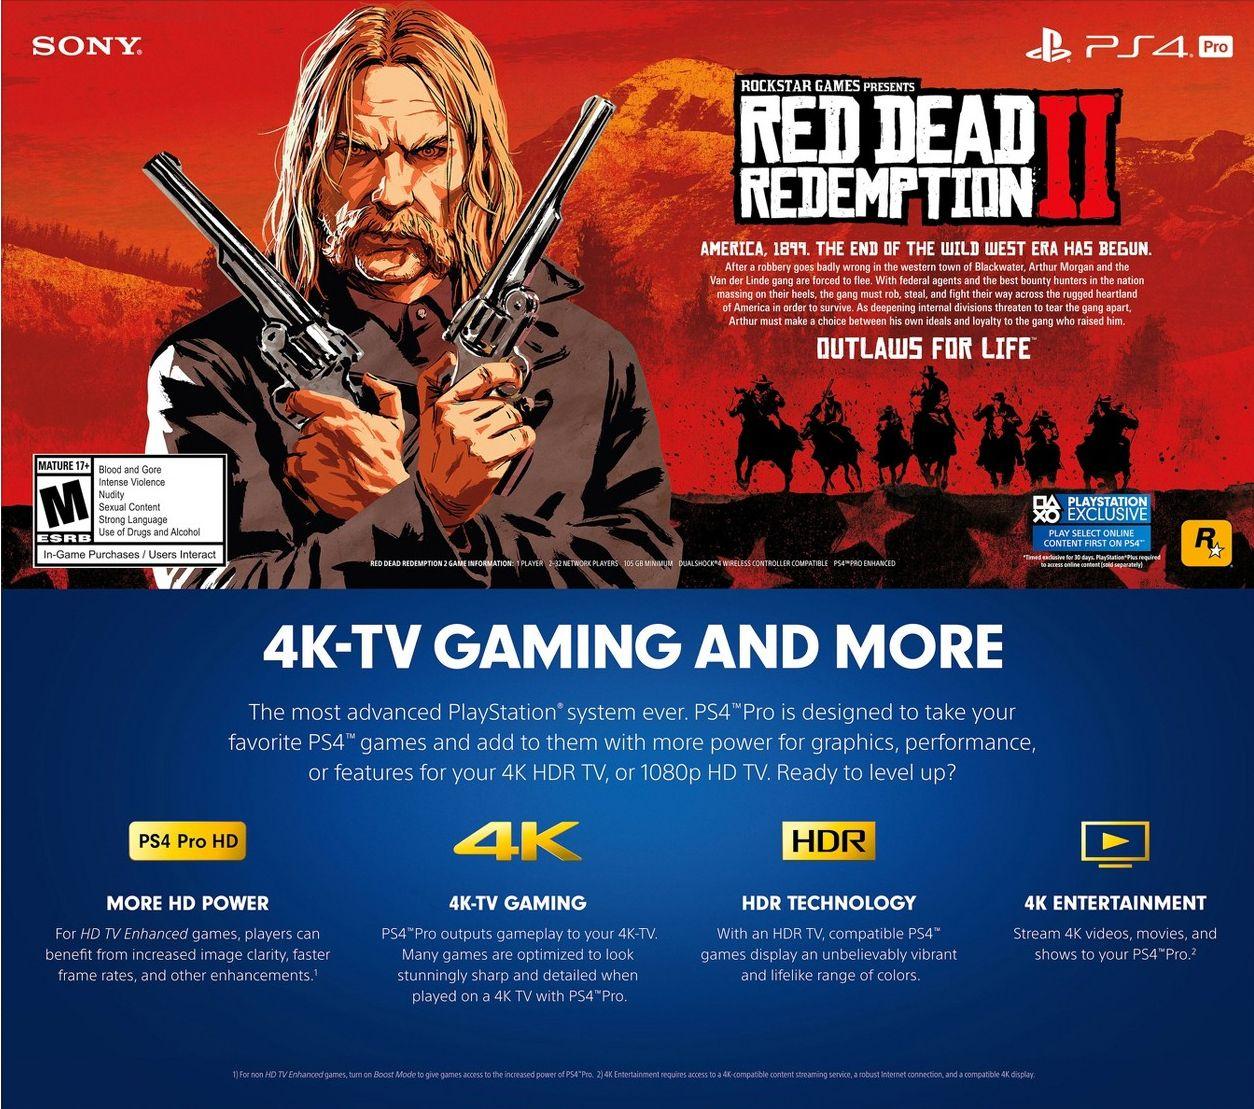 Red Dead Redemption 2 vyžaduje na disku přes 100 GB Red Dead Redemption 2 reklama PS4 Pro